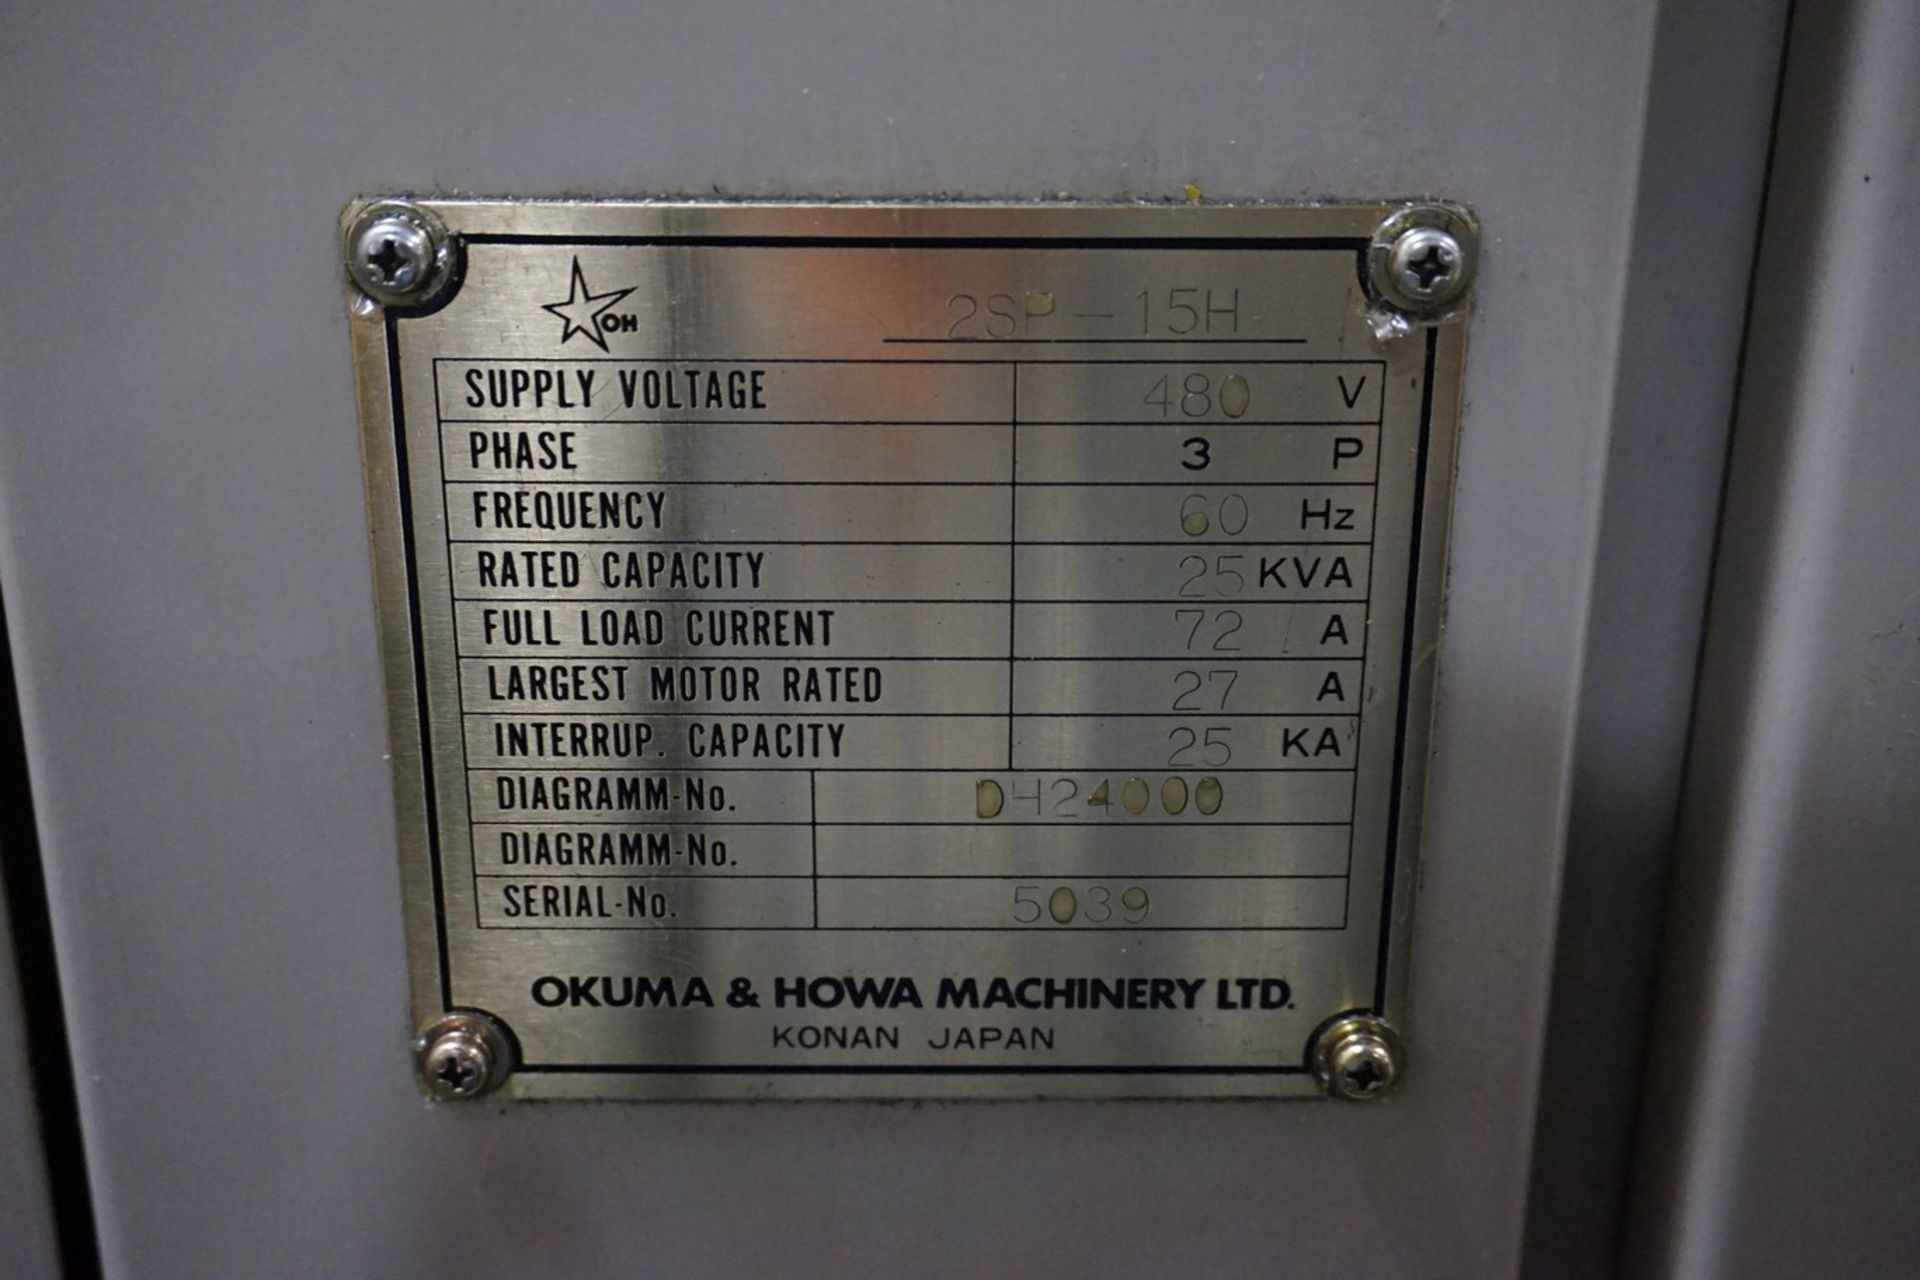 Okuma-Howa Model 2SP-15H CNC Lathe c/w Fanuc 18-TT Controller, Transformer - Image 6 of 6